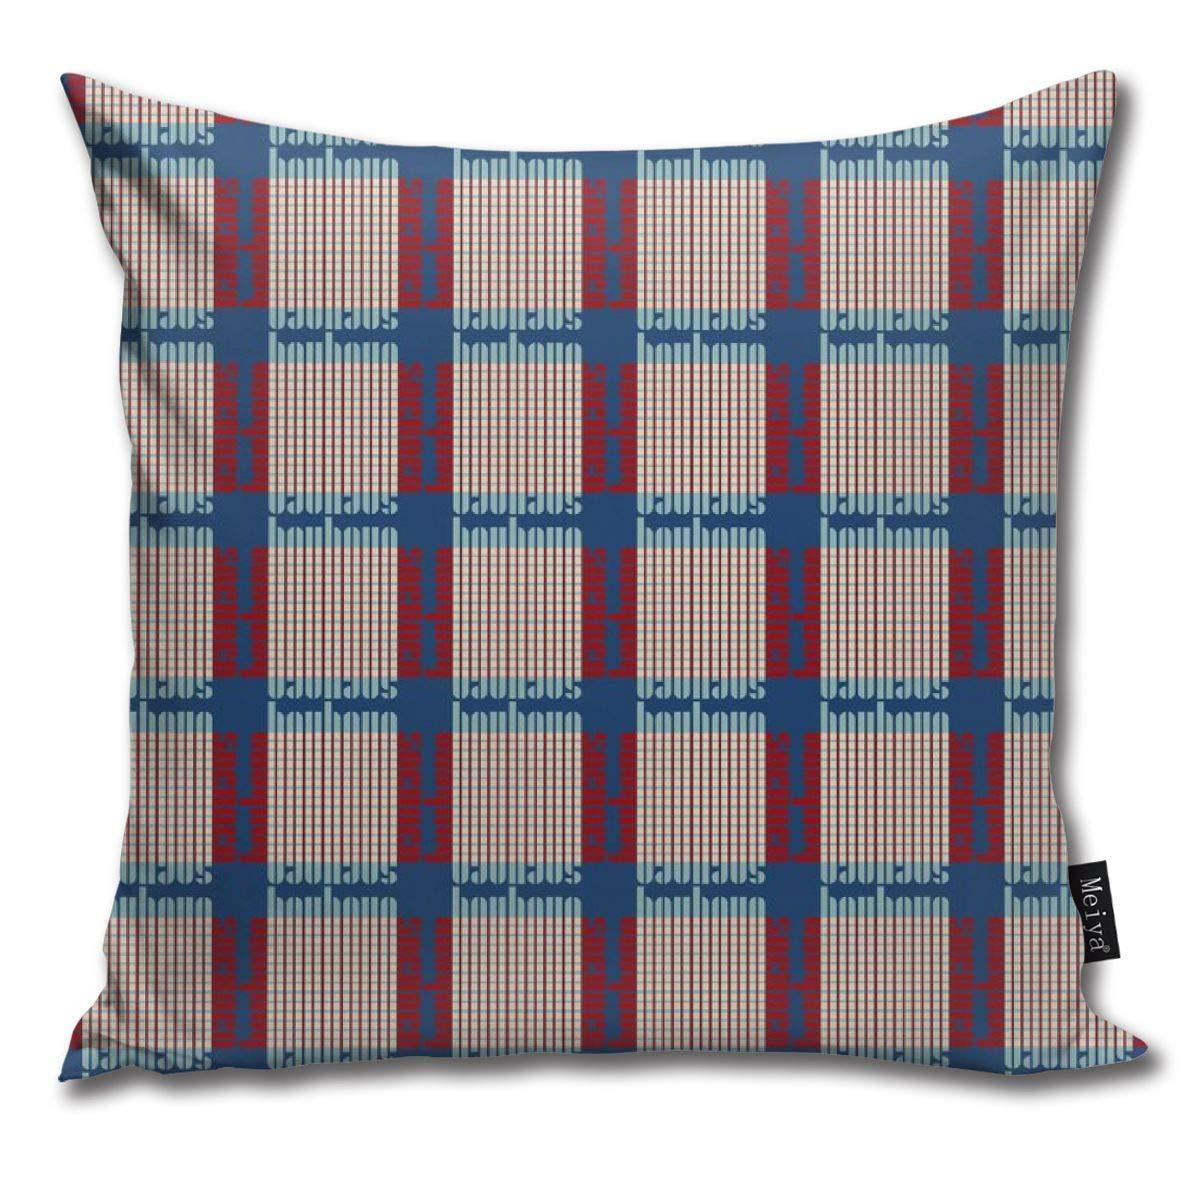 Amazon.com: Brecoy Bauhaus Plaid Pacificeggred Throw Pillow ...